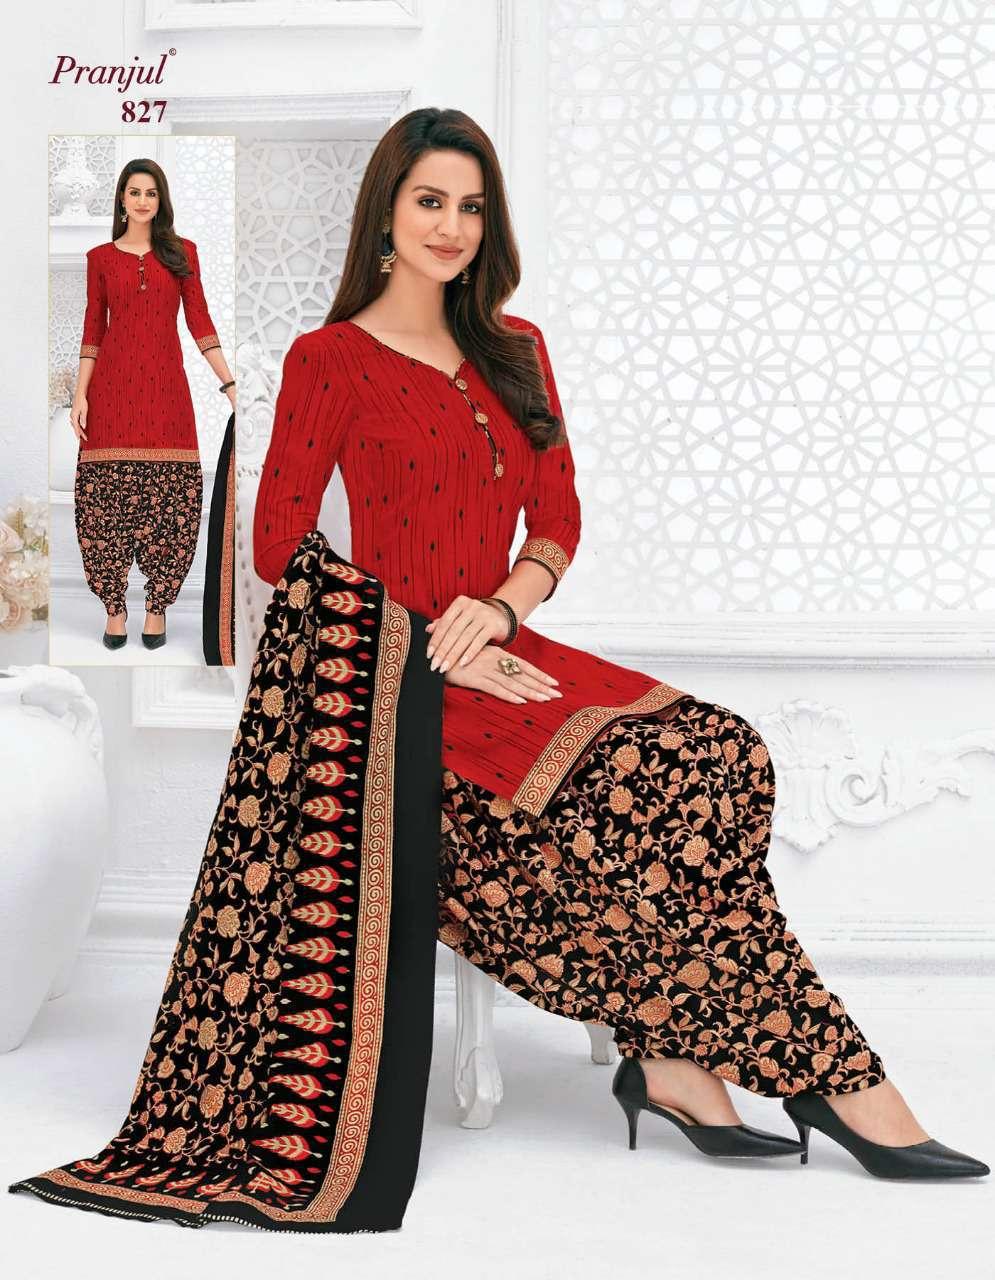 Pranjul 3XL Priyanka Vol 8 B Readymade Suit Wholesale Catalog 15 Pcs 10 - Pranjul 3XL Priyanka Vol 8 B Readymade Suit Wholesale Catalog 15 Pcs